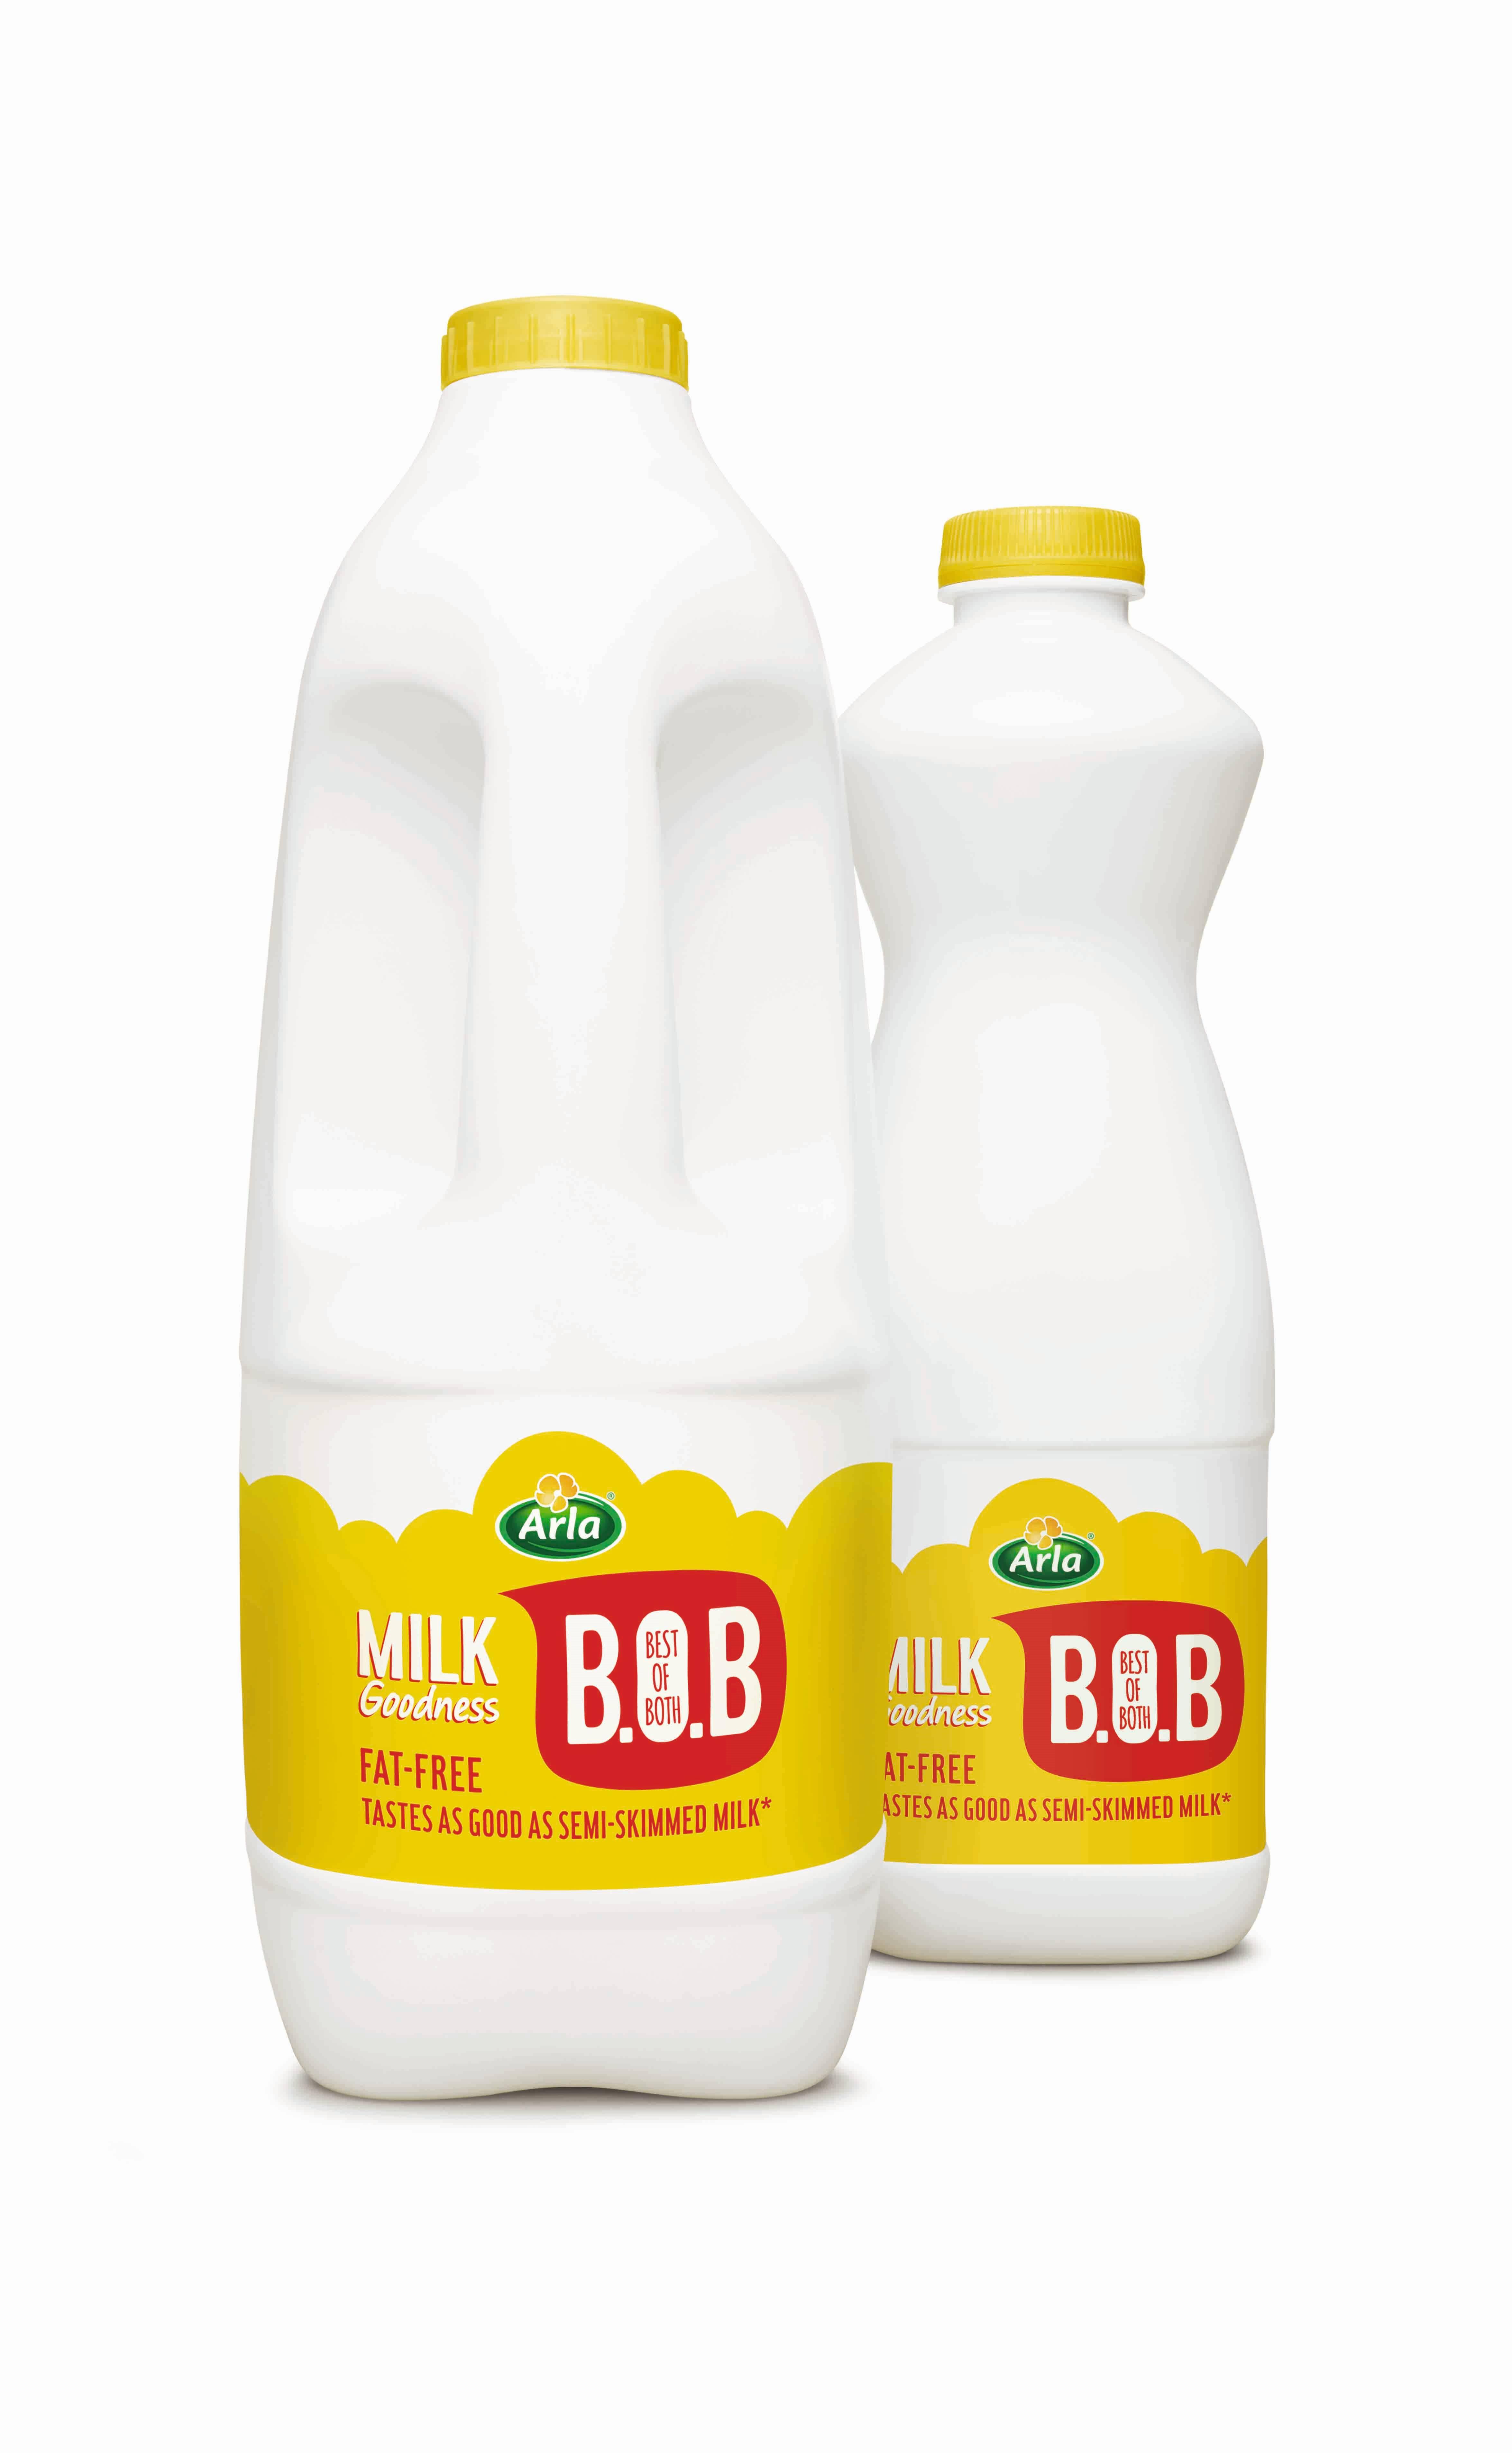 Arla Launches Best Of Both Yellow Top Milk